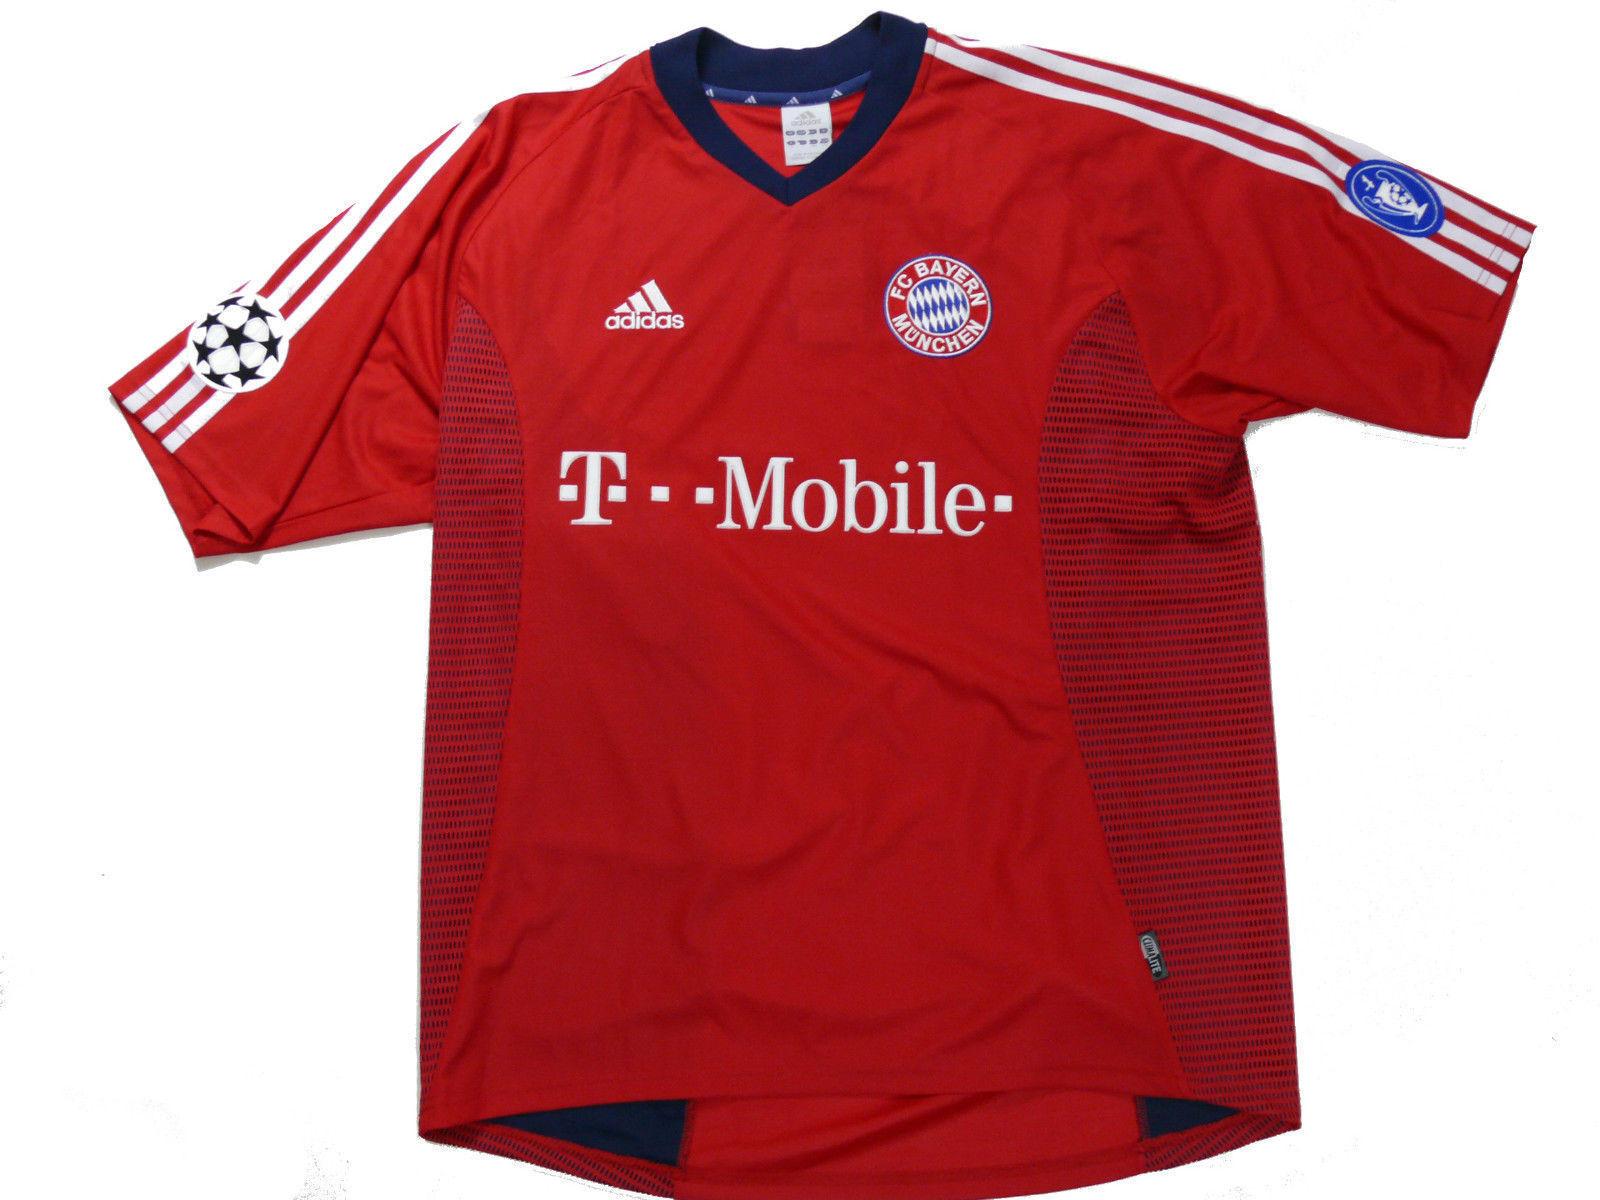 b59634bb6b8 FC Bayern MUNCHEN Munich adidas Germany T-mobile Soccer Jersey Football 2xl  for sale online